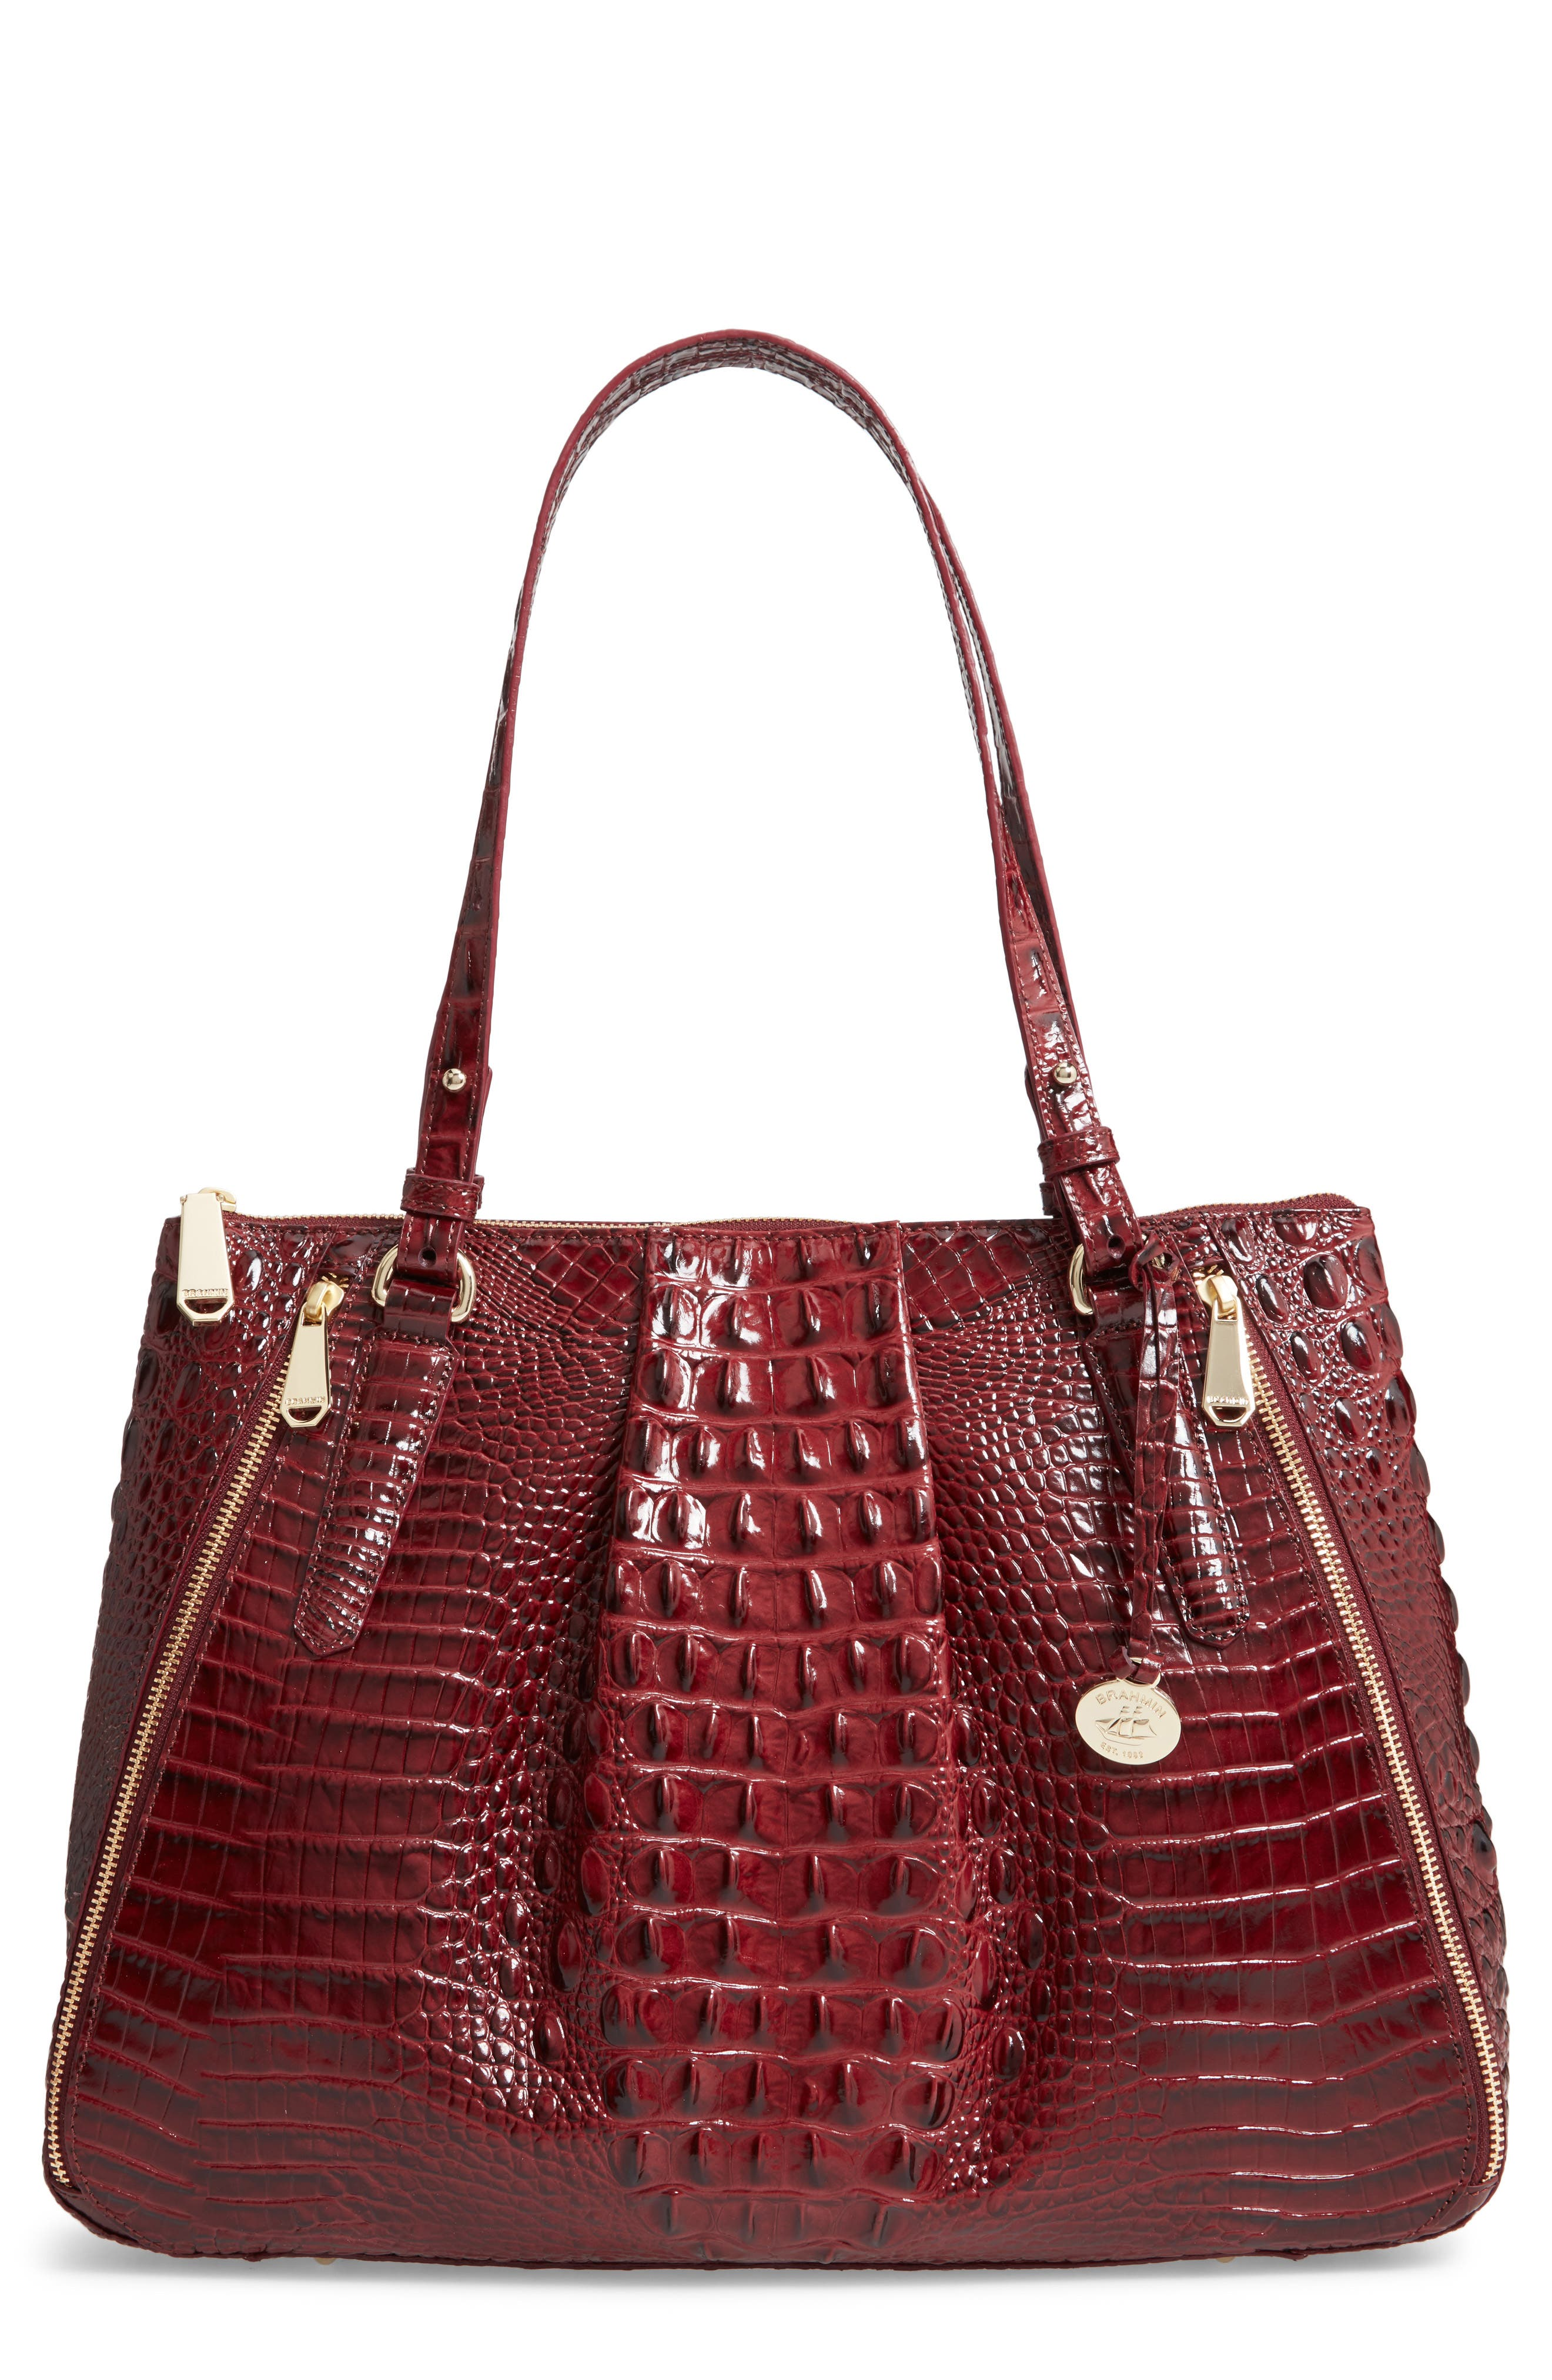 Melbourne - Adina Croc Embossed Leather Satchel,                             Main thumbnail 1, color,                             Tart